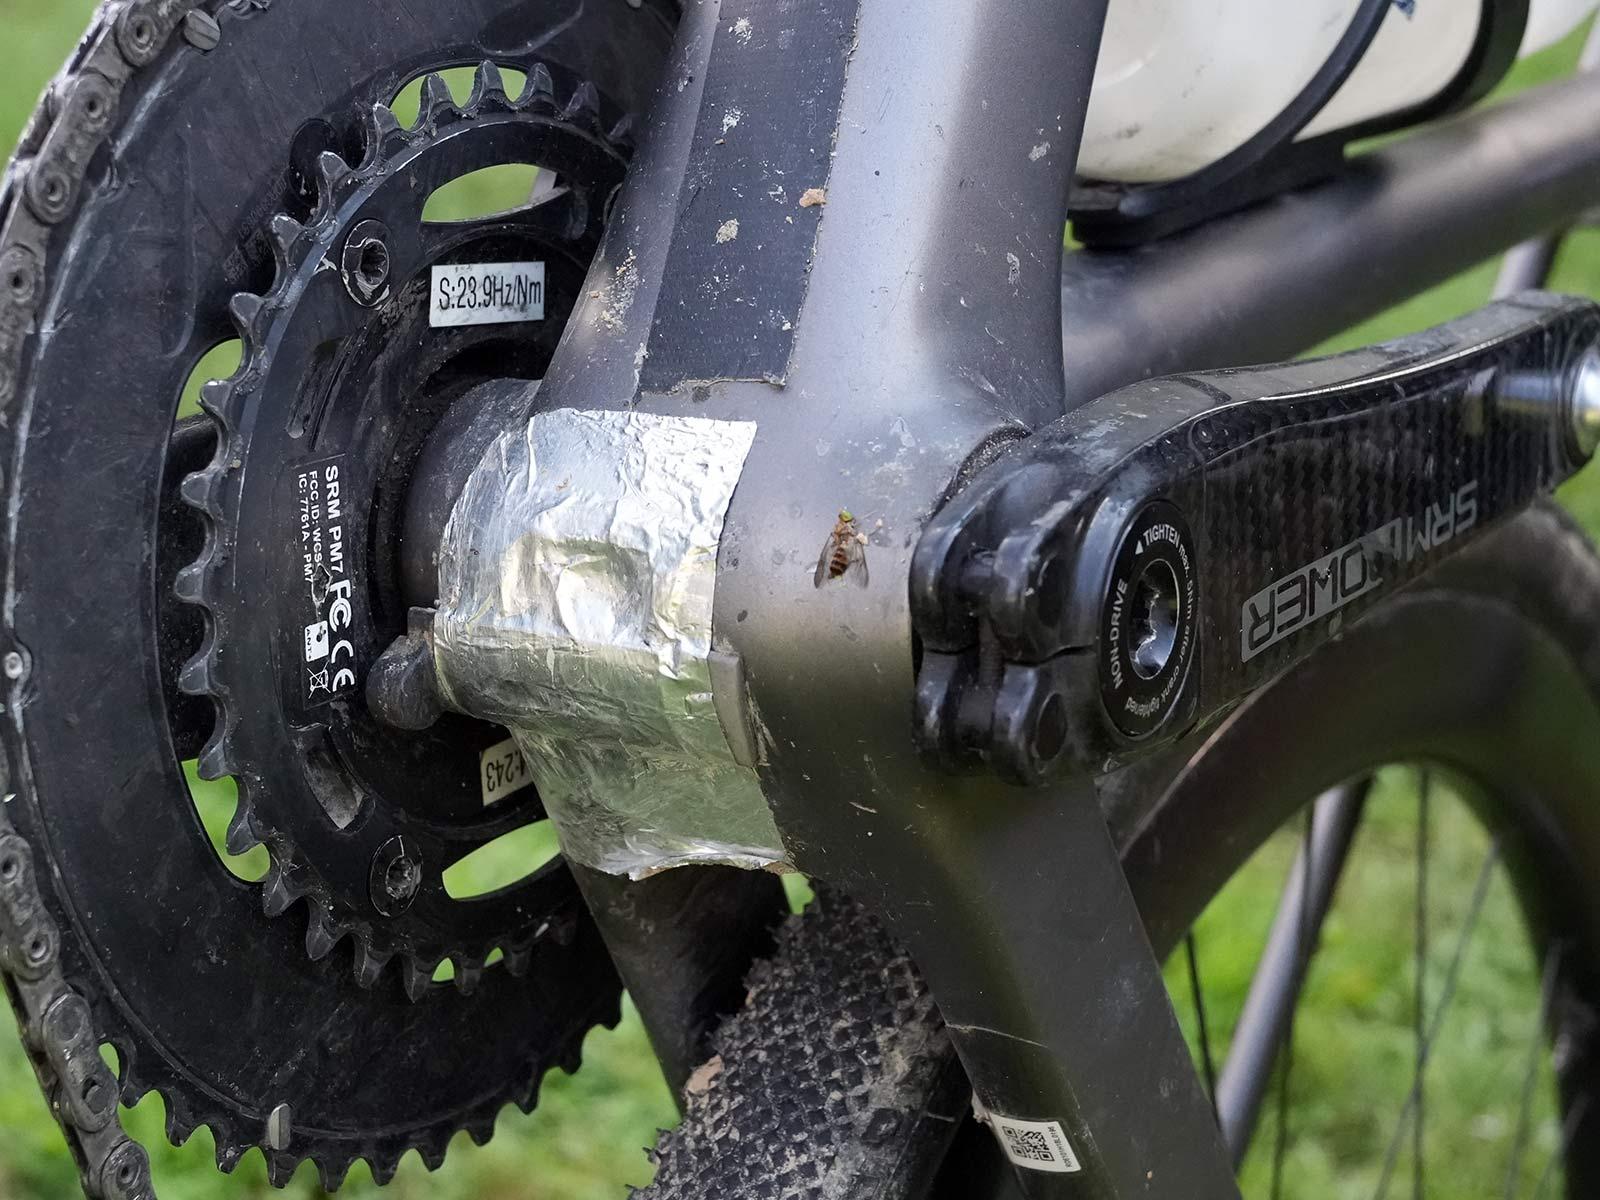 power meter crankset magnet hack on jeremiah bishop's gravel race bike